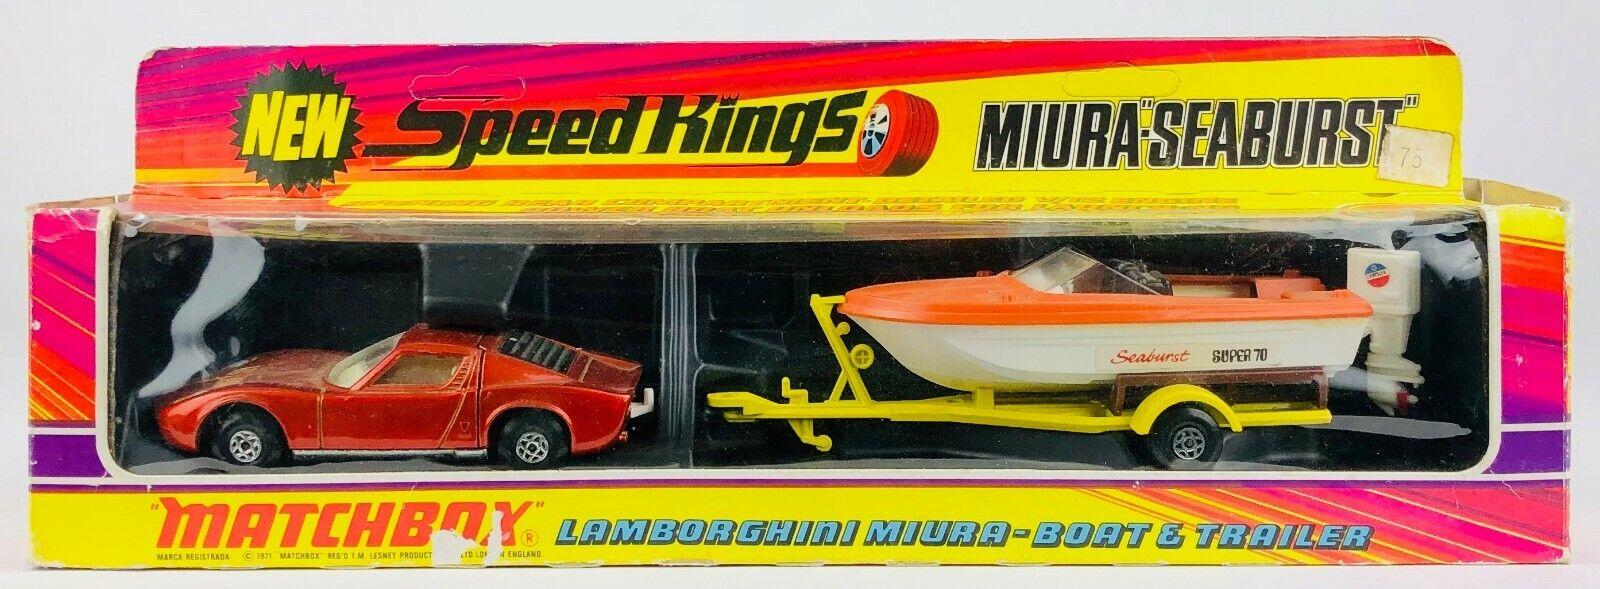 TEAM MATCHBOX SPEEDKINGS -LAMBORGHINI MIURA-BOAT & TRAILER- MODEL K-29 BOXED